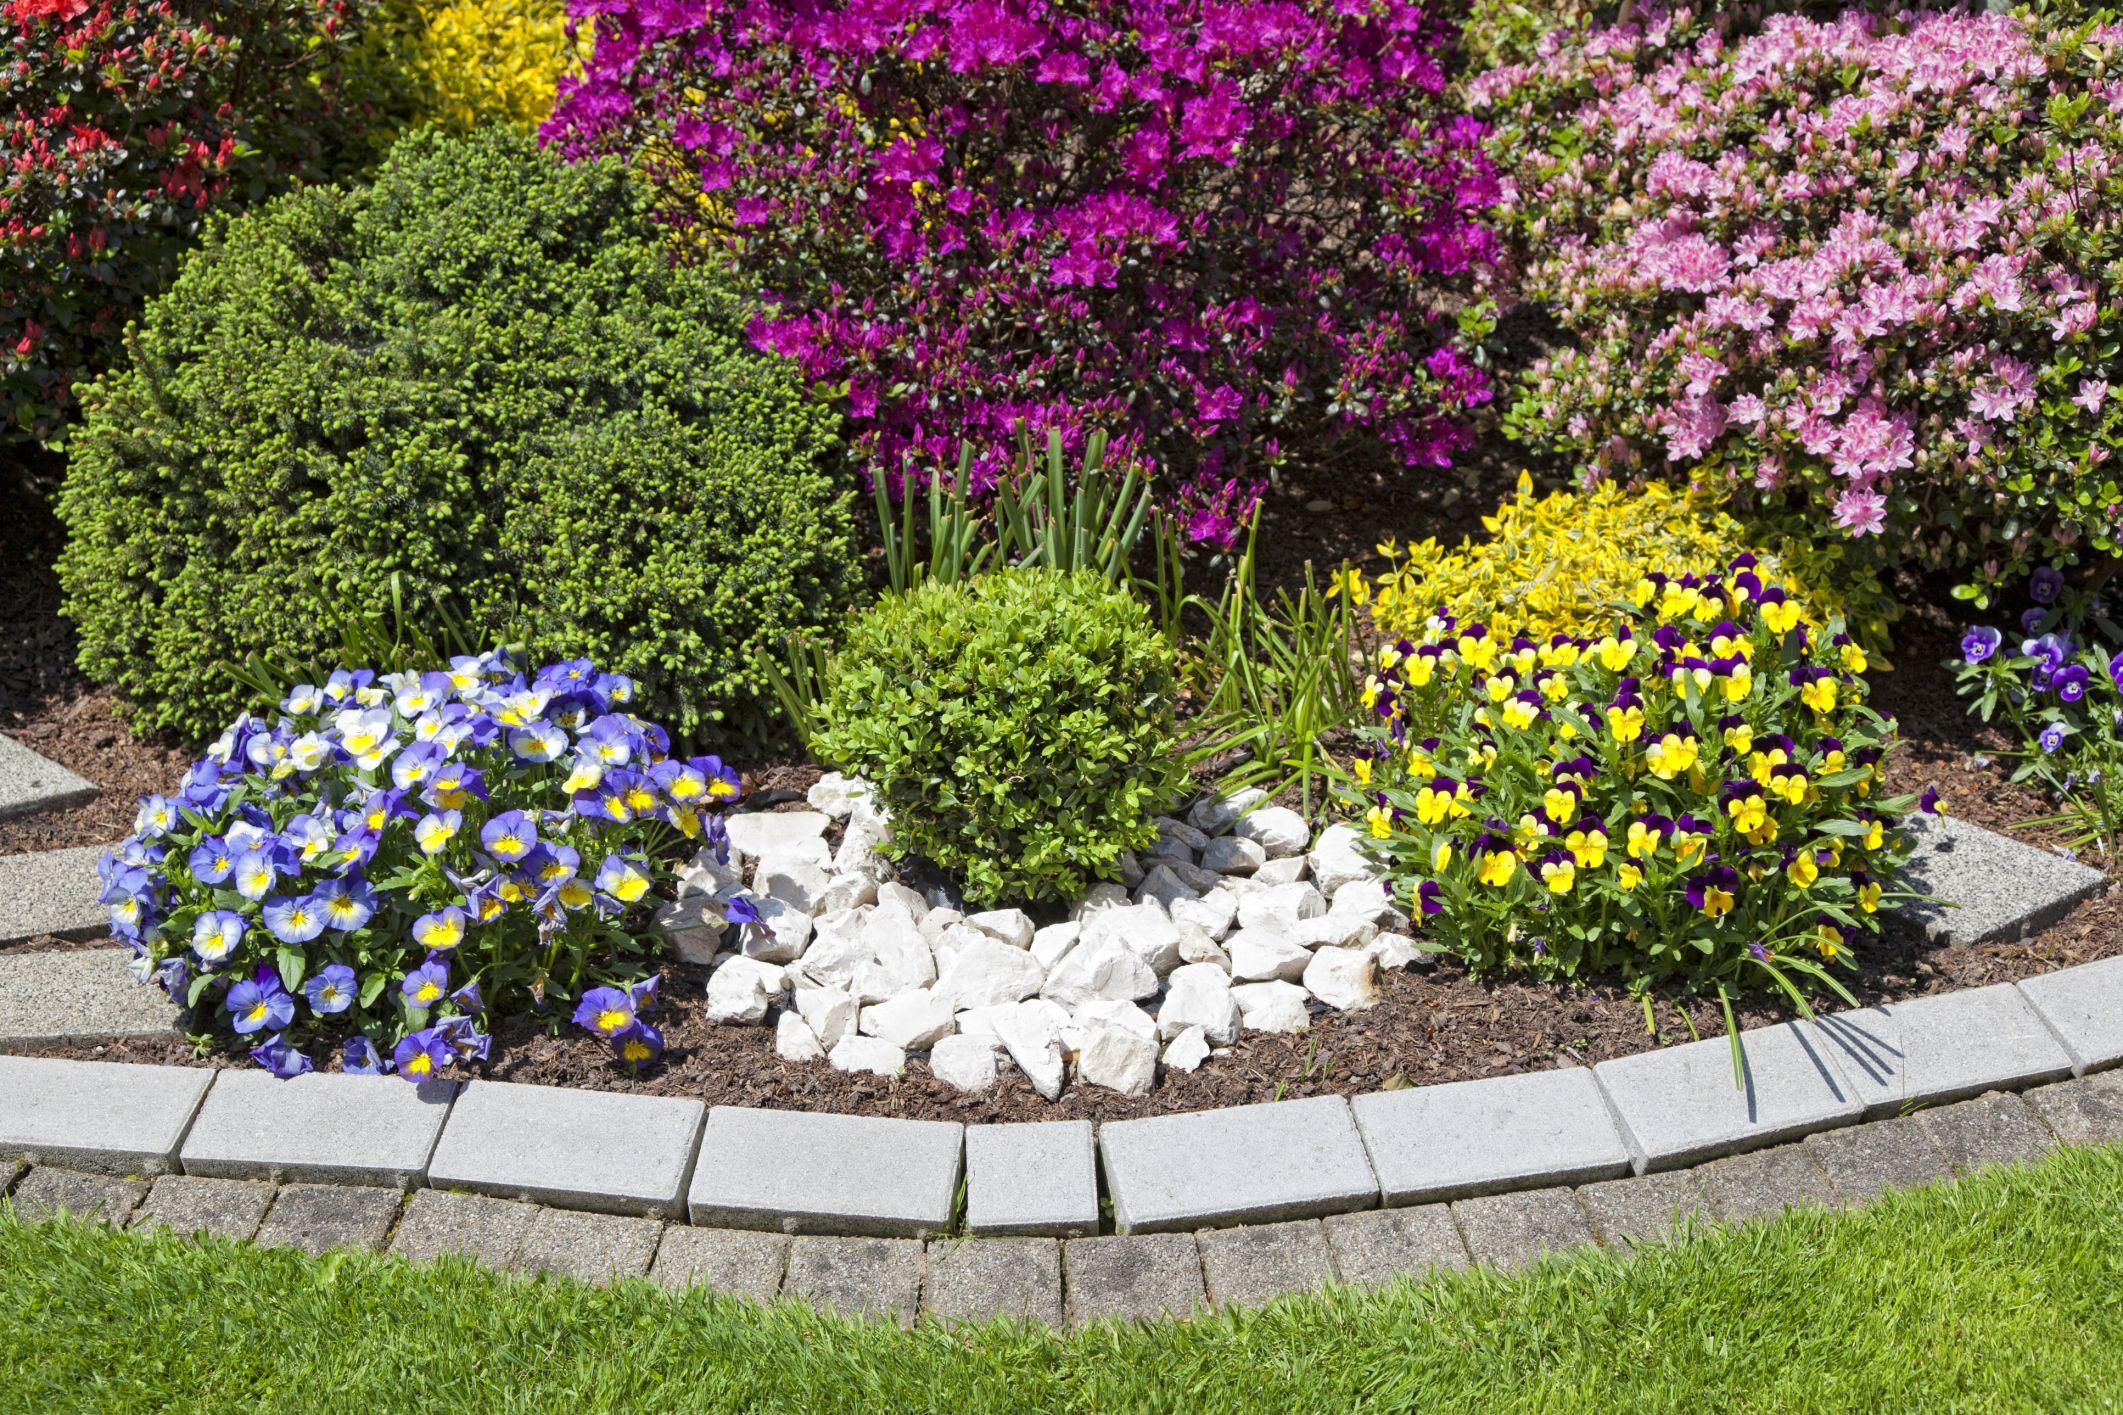 Decoracion de jardines exteriores jardines jardiner a for Decoracion para jardines exteriores